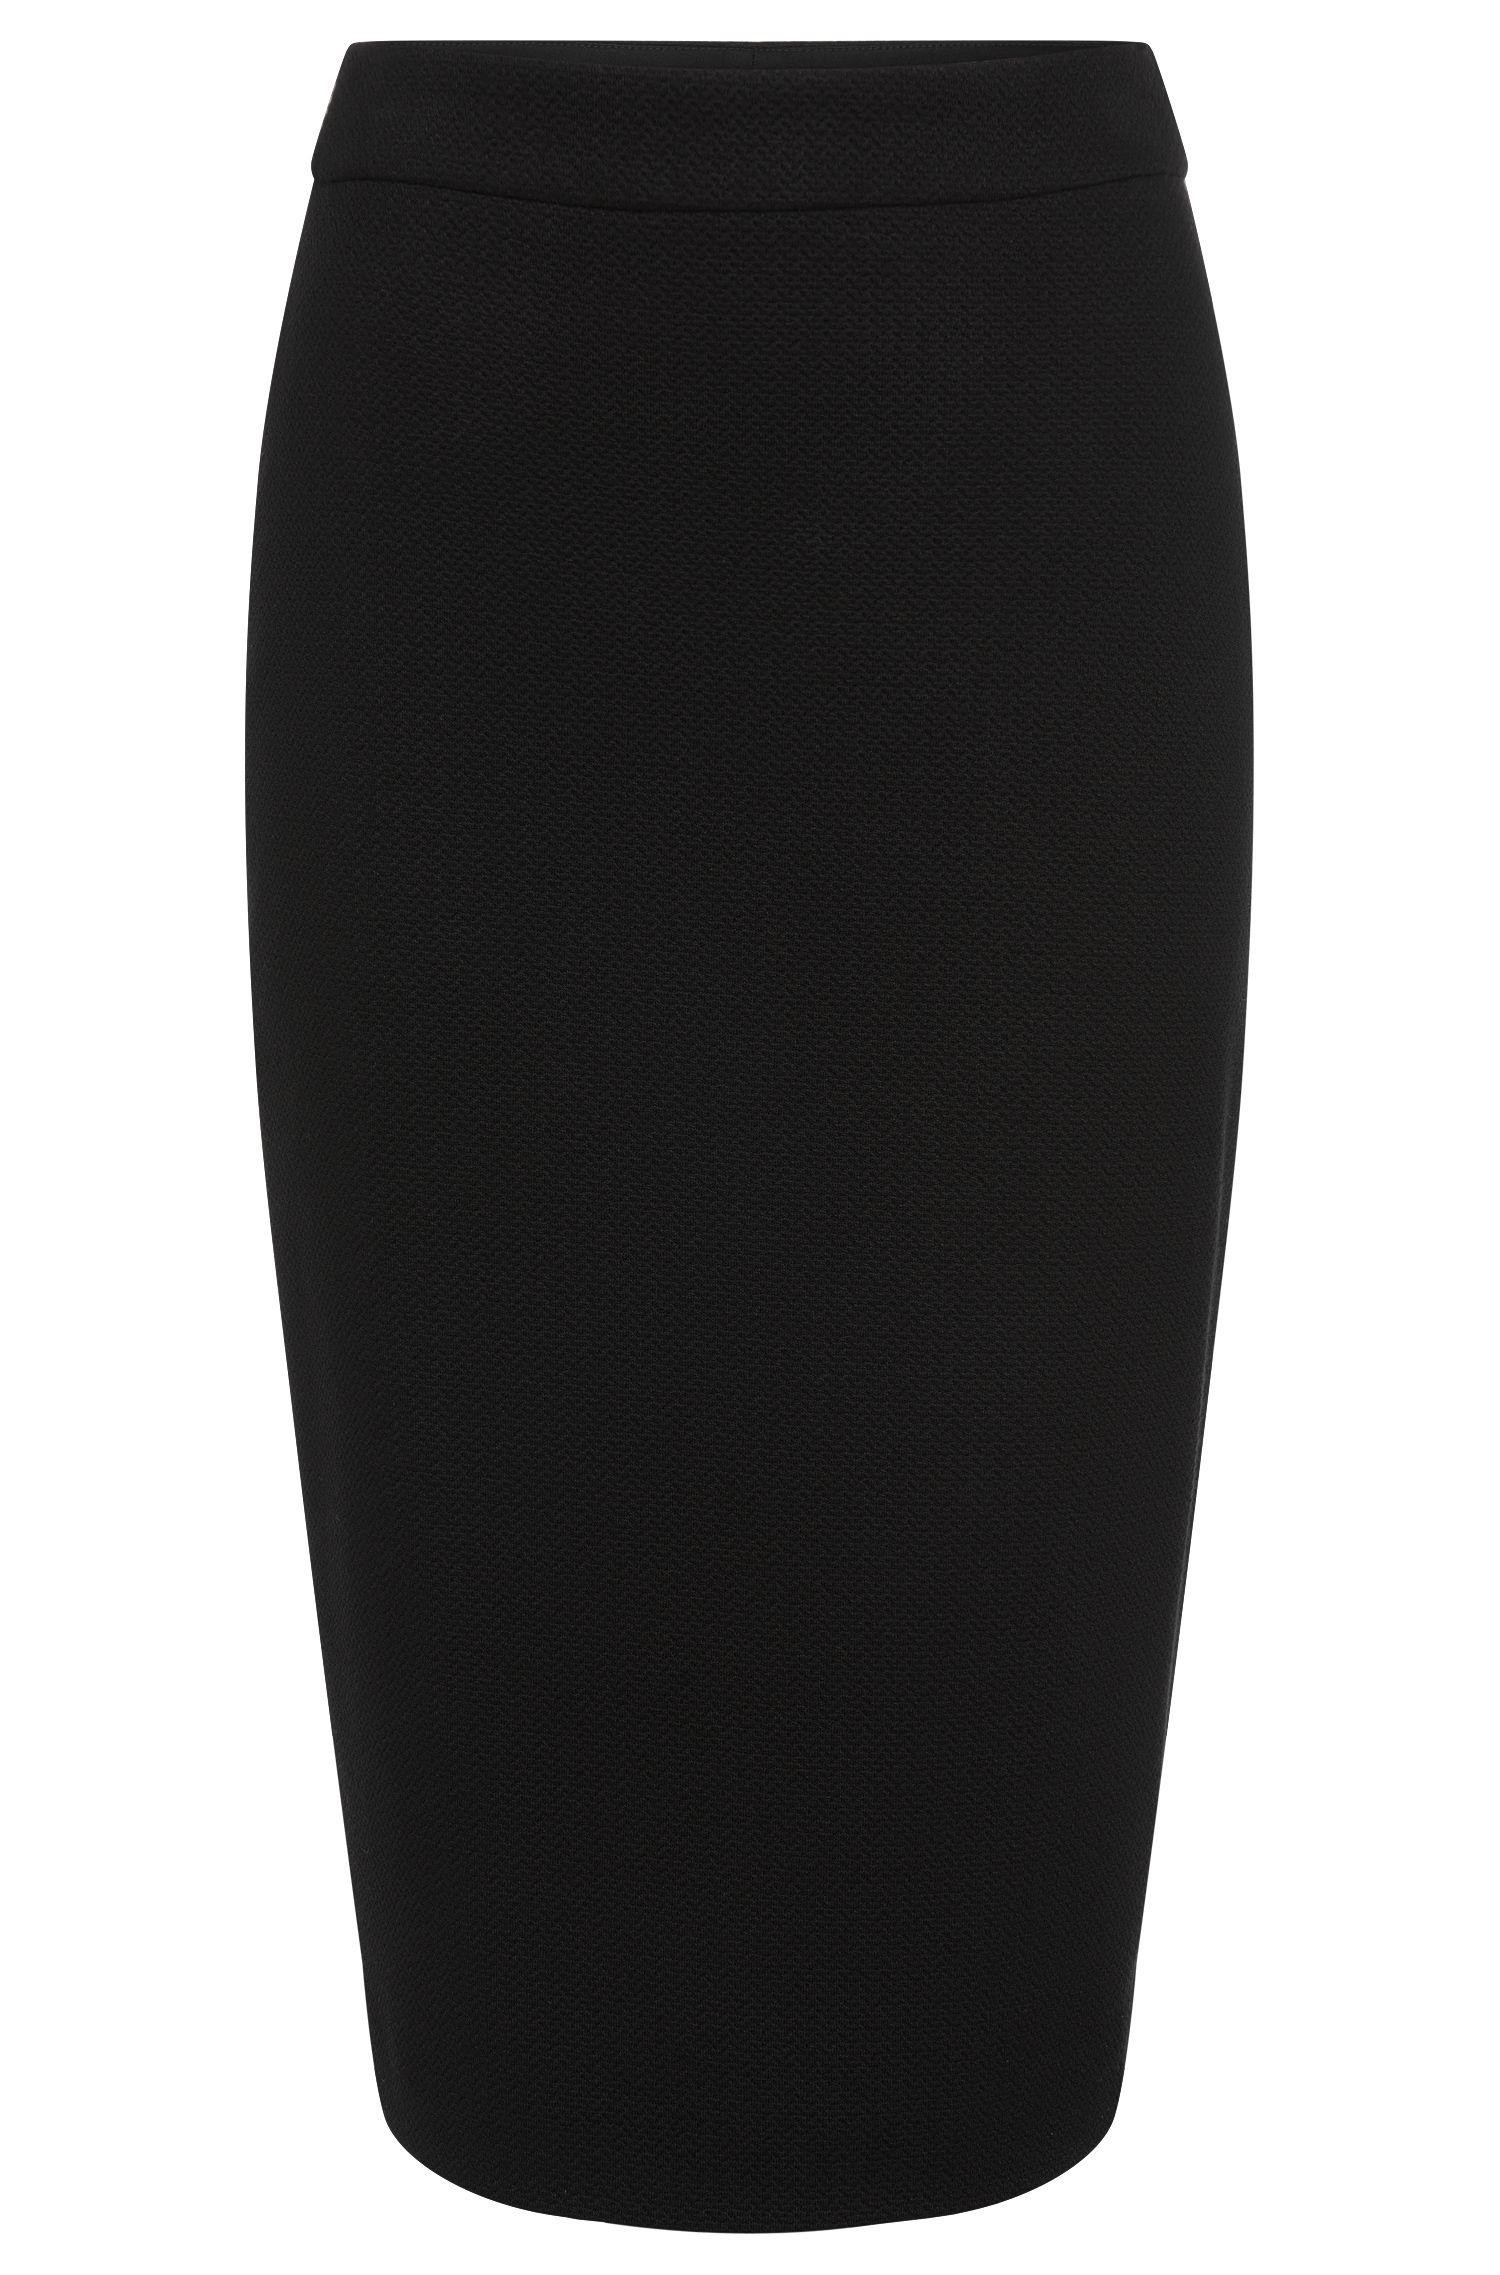 Stretch Viscose Textured Pencil Skirt | Melala